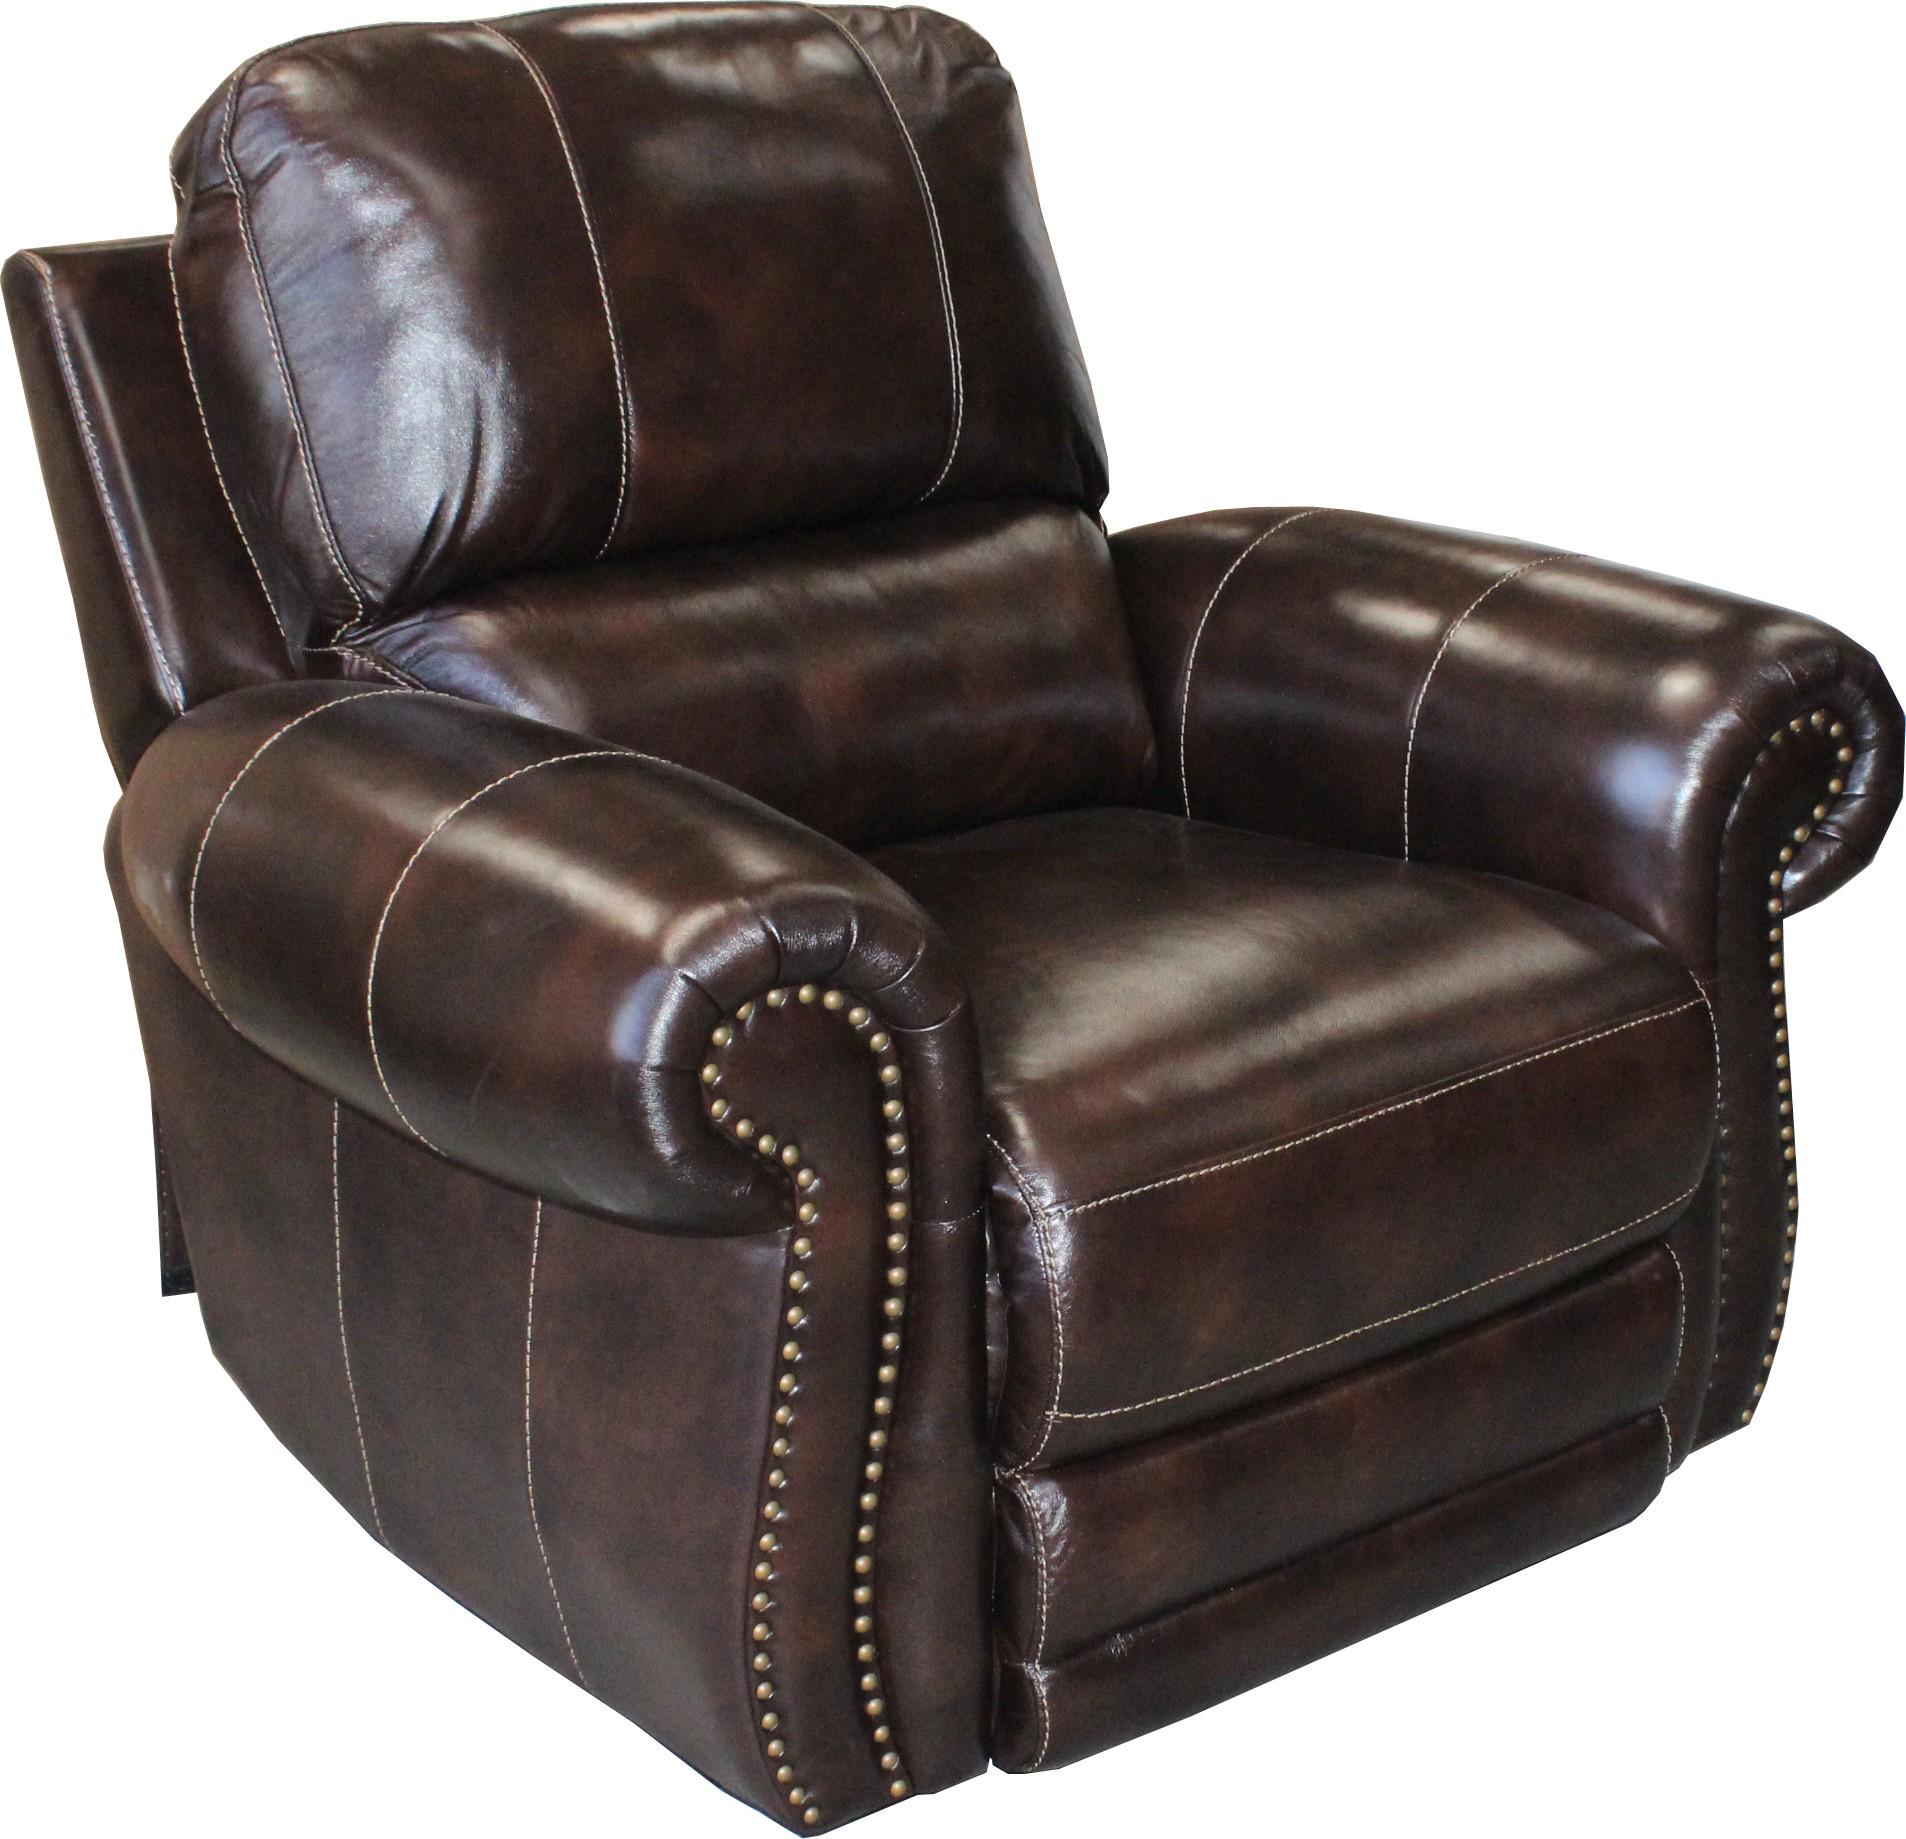 howell sofa london company tottenham court road thurston havana power recliner from parker living